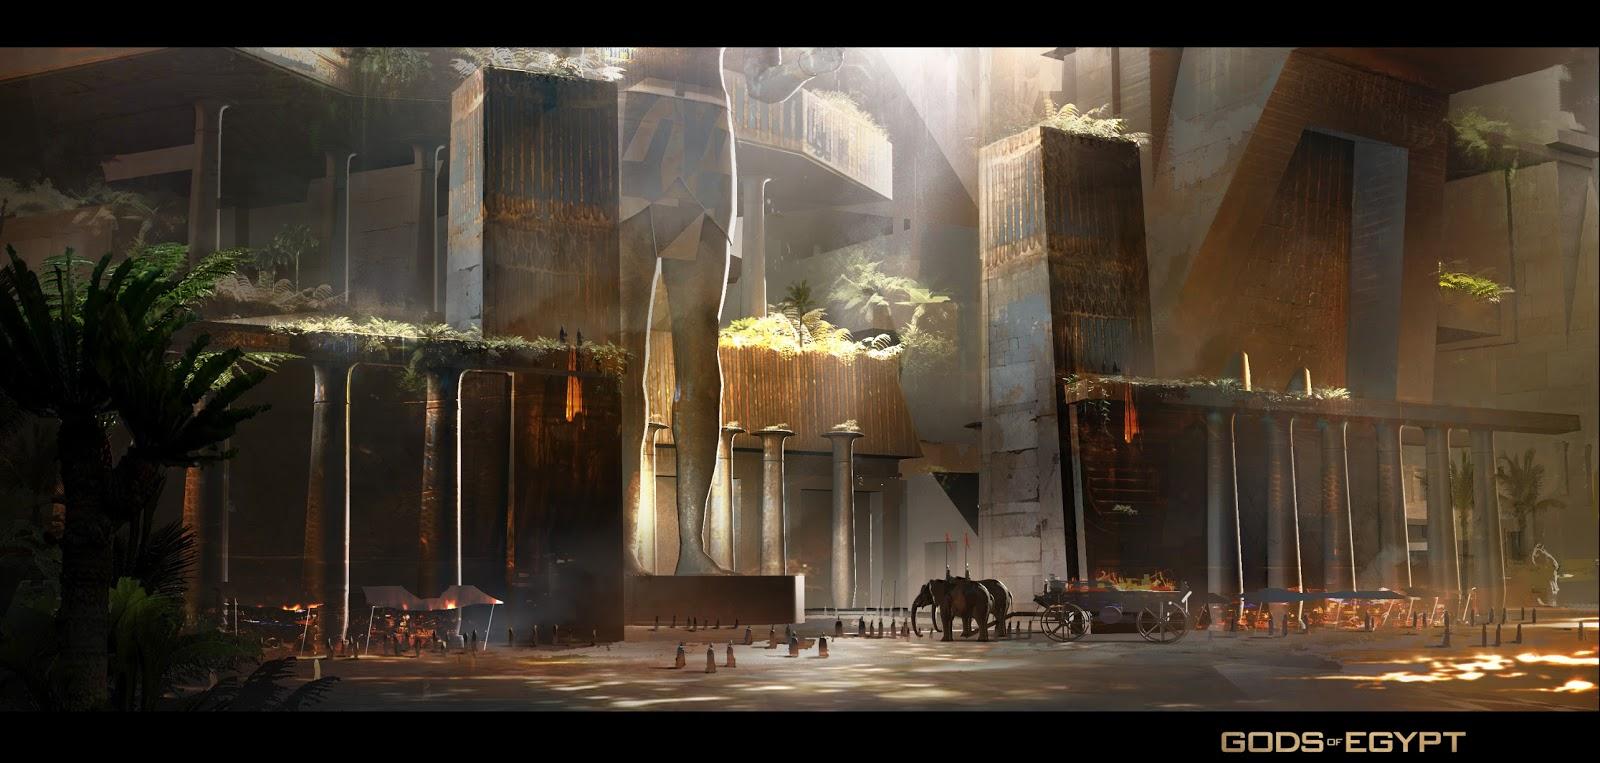 Gods of Egypt Concept Art by Gerhard Mozsi